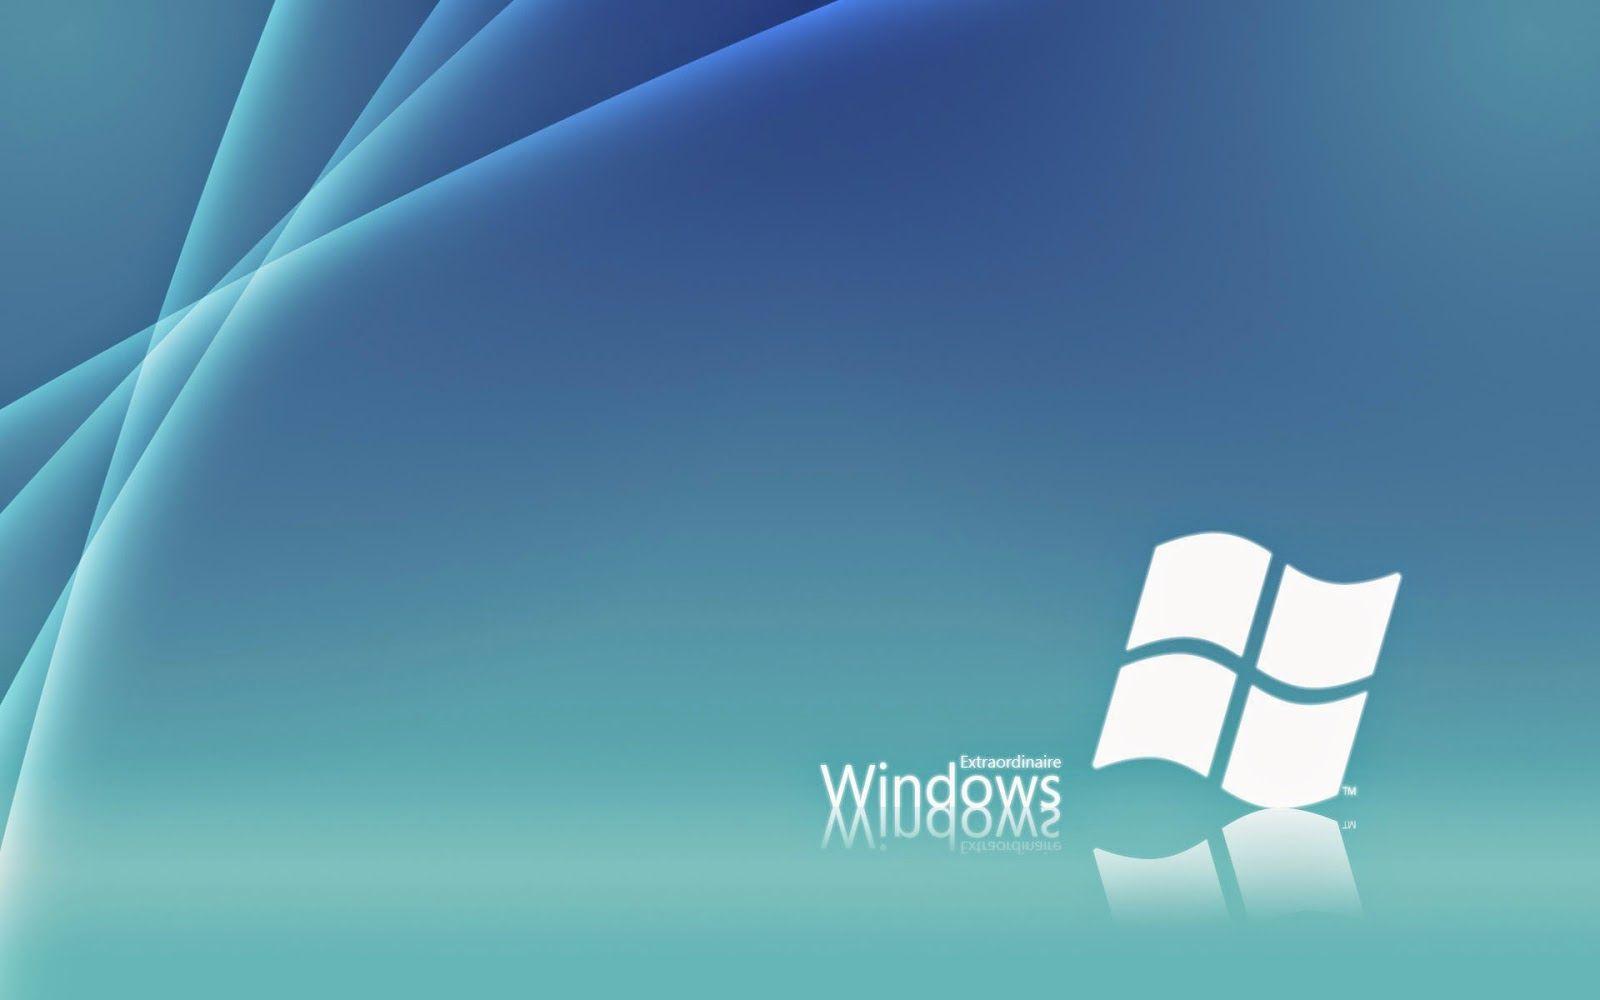 35 Best Free Windows 7 Professional Desktop Wallpapers Wallpaperaccess